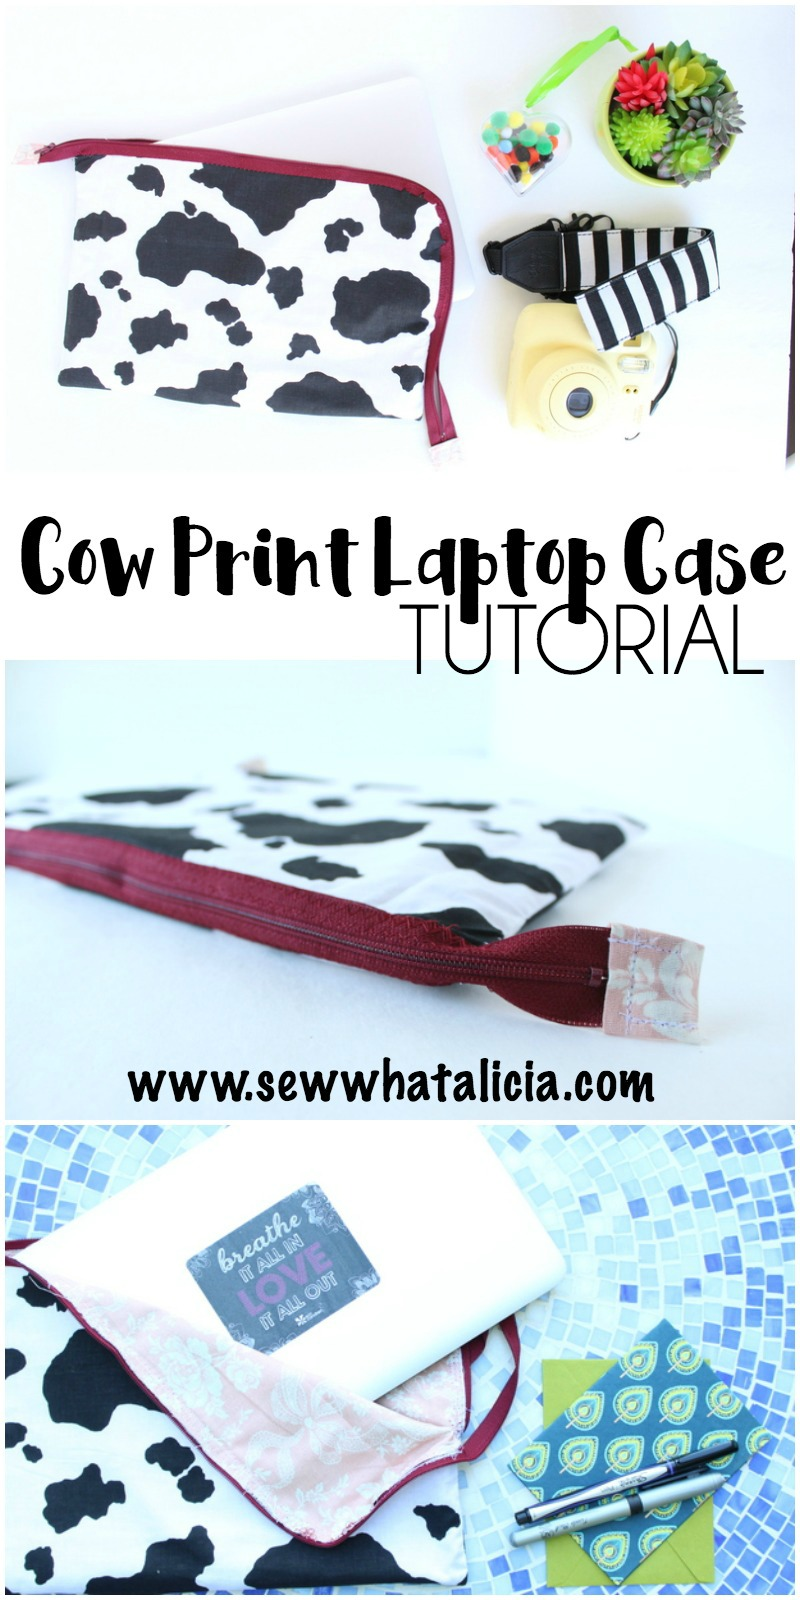 Cow Print Laptop Case | www.sewwhatalicia.com